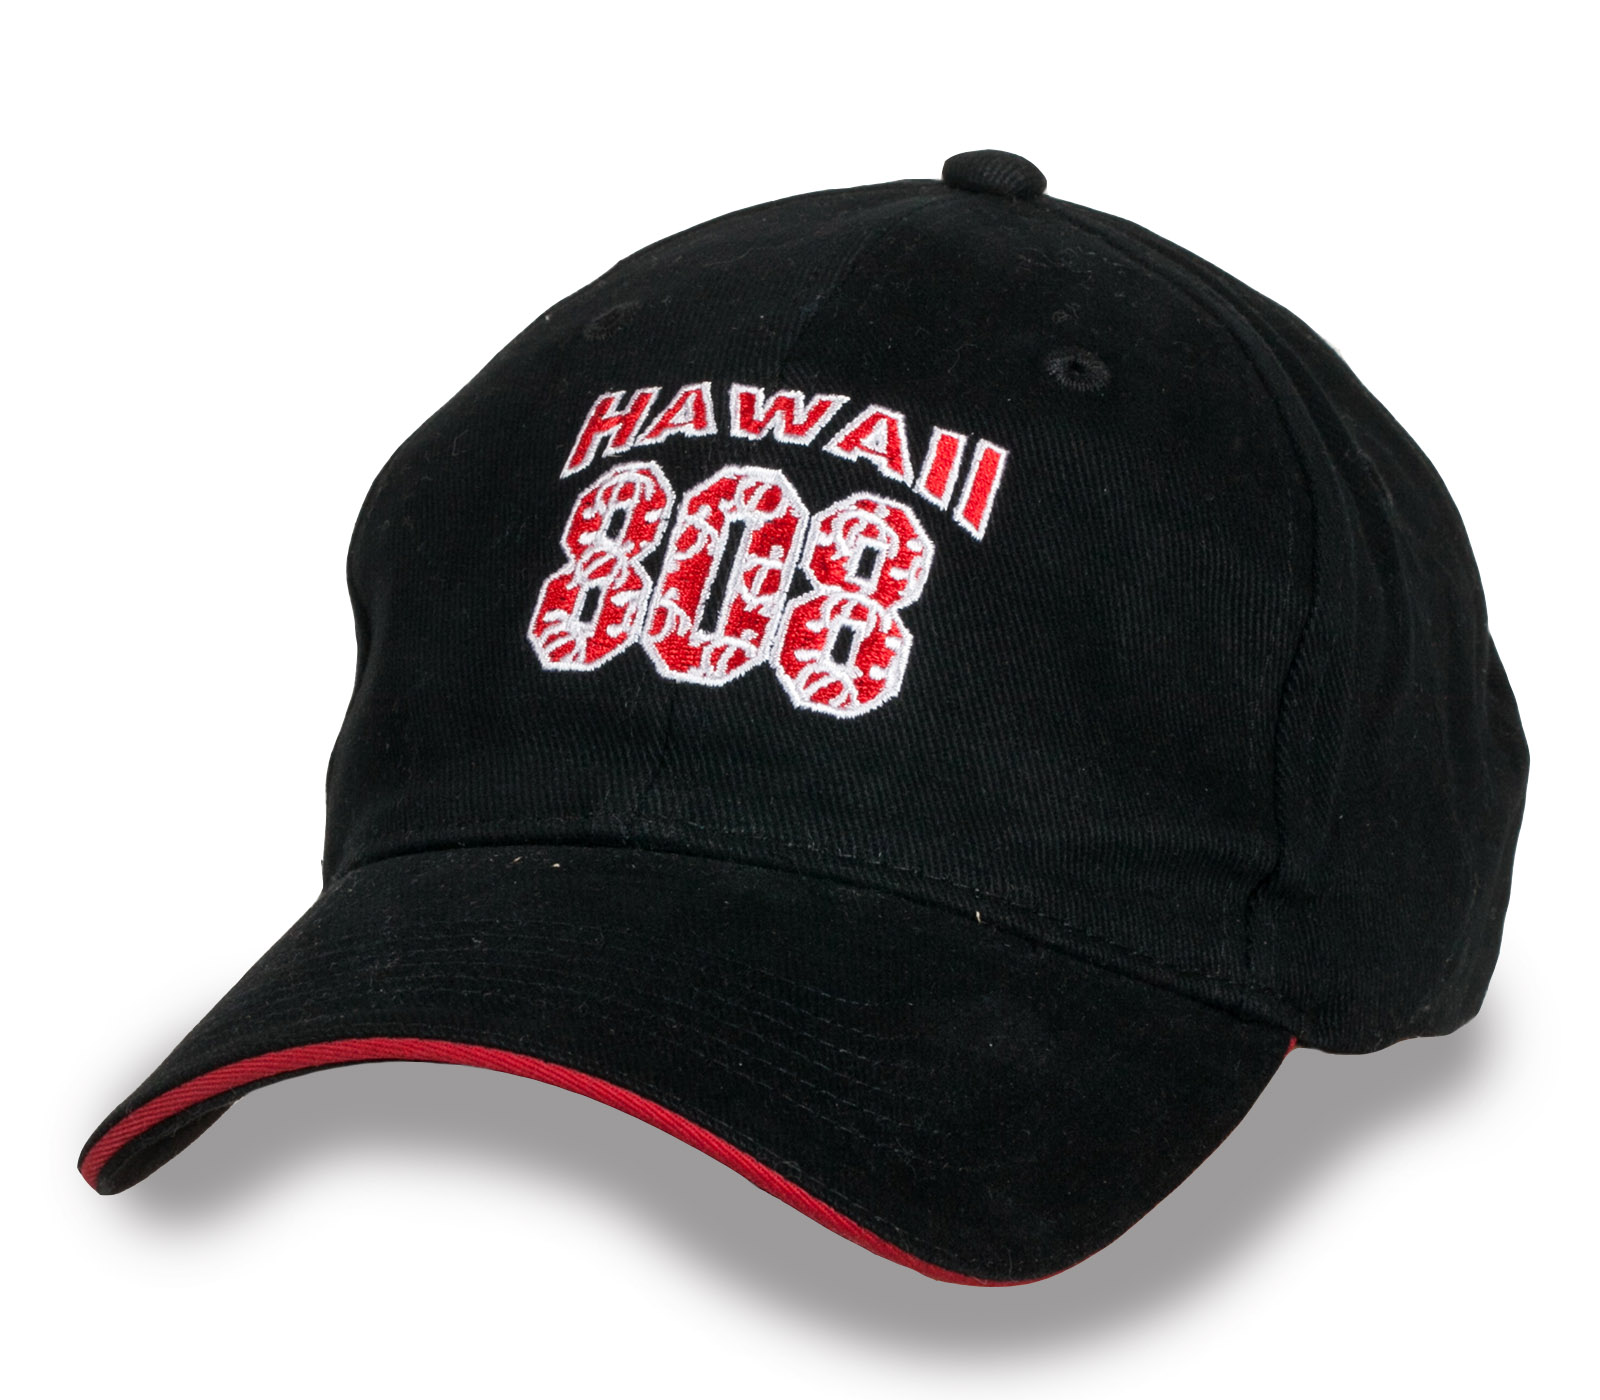 Мужская бейсболка HAWAII 808